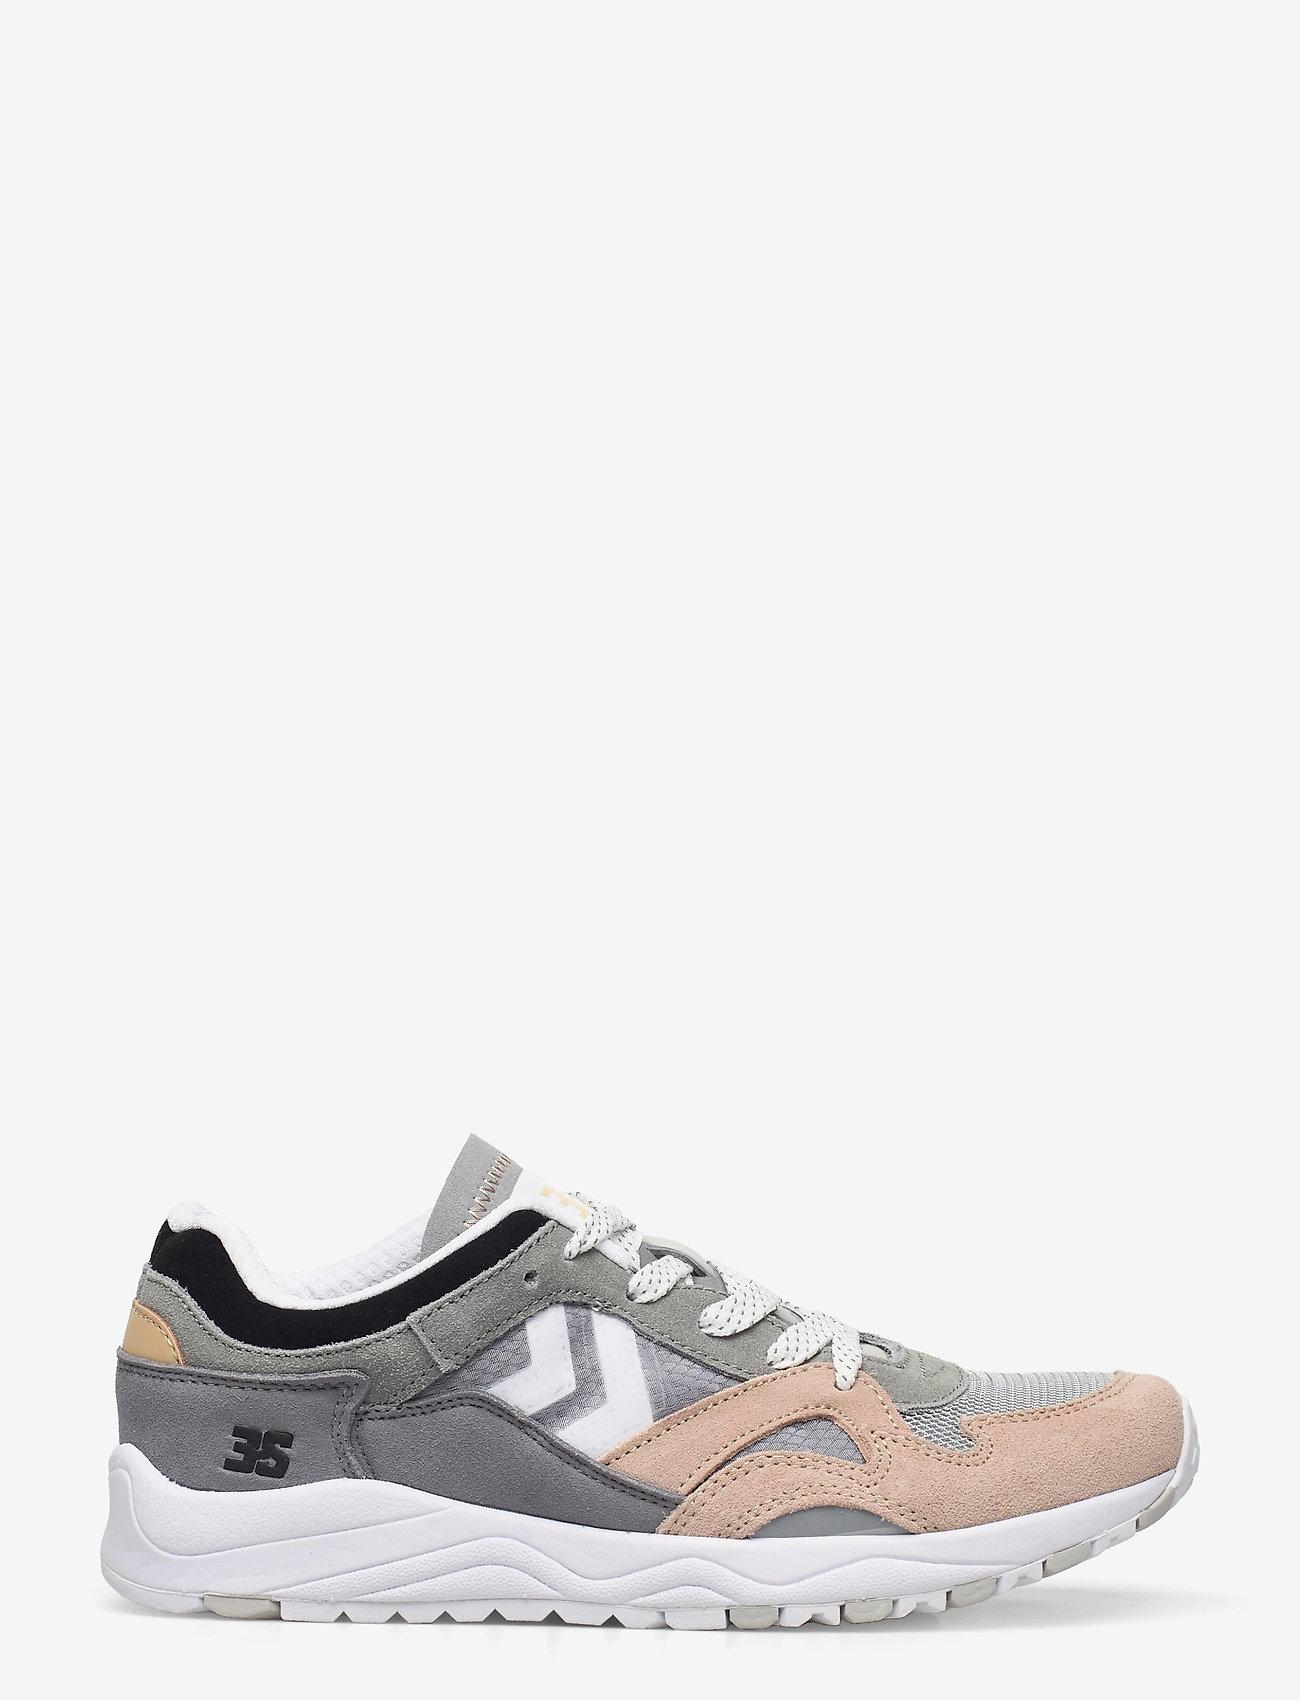 Hummel - EDMONTON 3S SUEDE - laag sneakers - sharkskin - 0